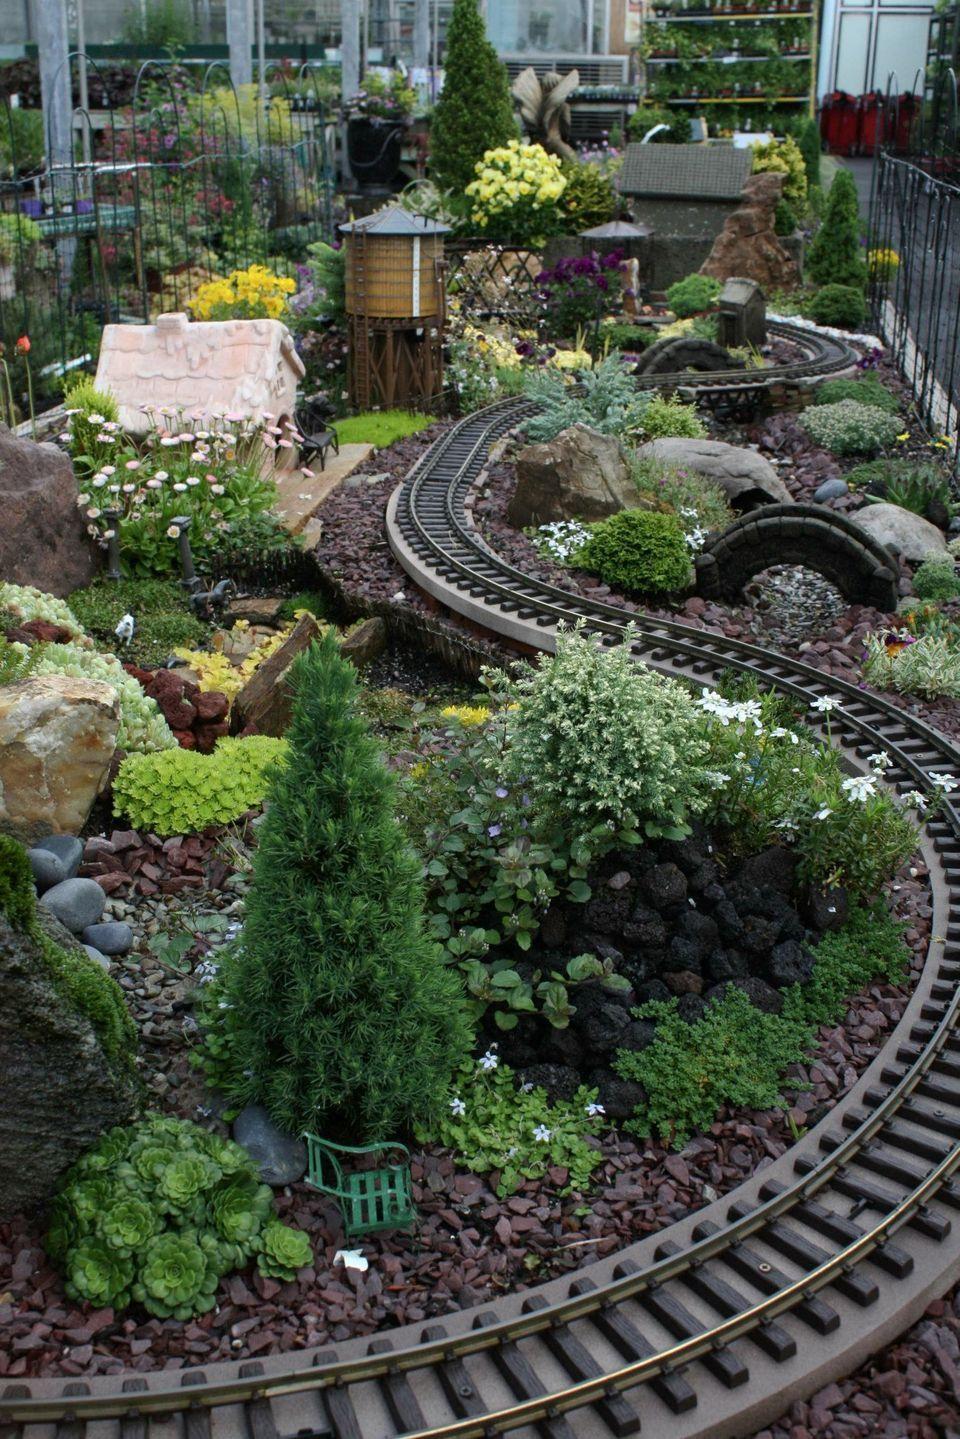 Amazing Diy Mini Fairy Garden For Miniature Landscaping 68 Miniature Garden Miniature Fairy Gardens Garden Trains Diy backyard train plans